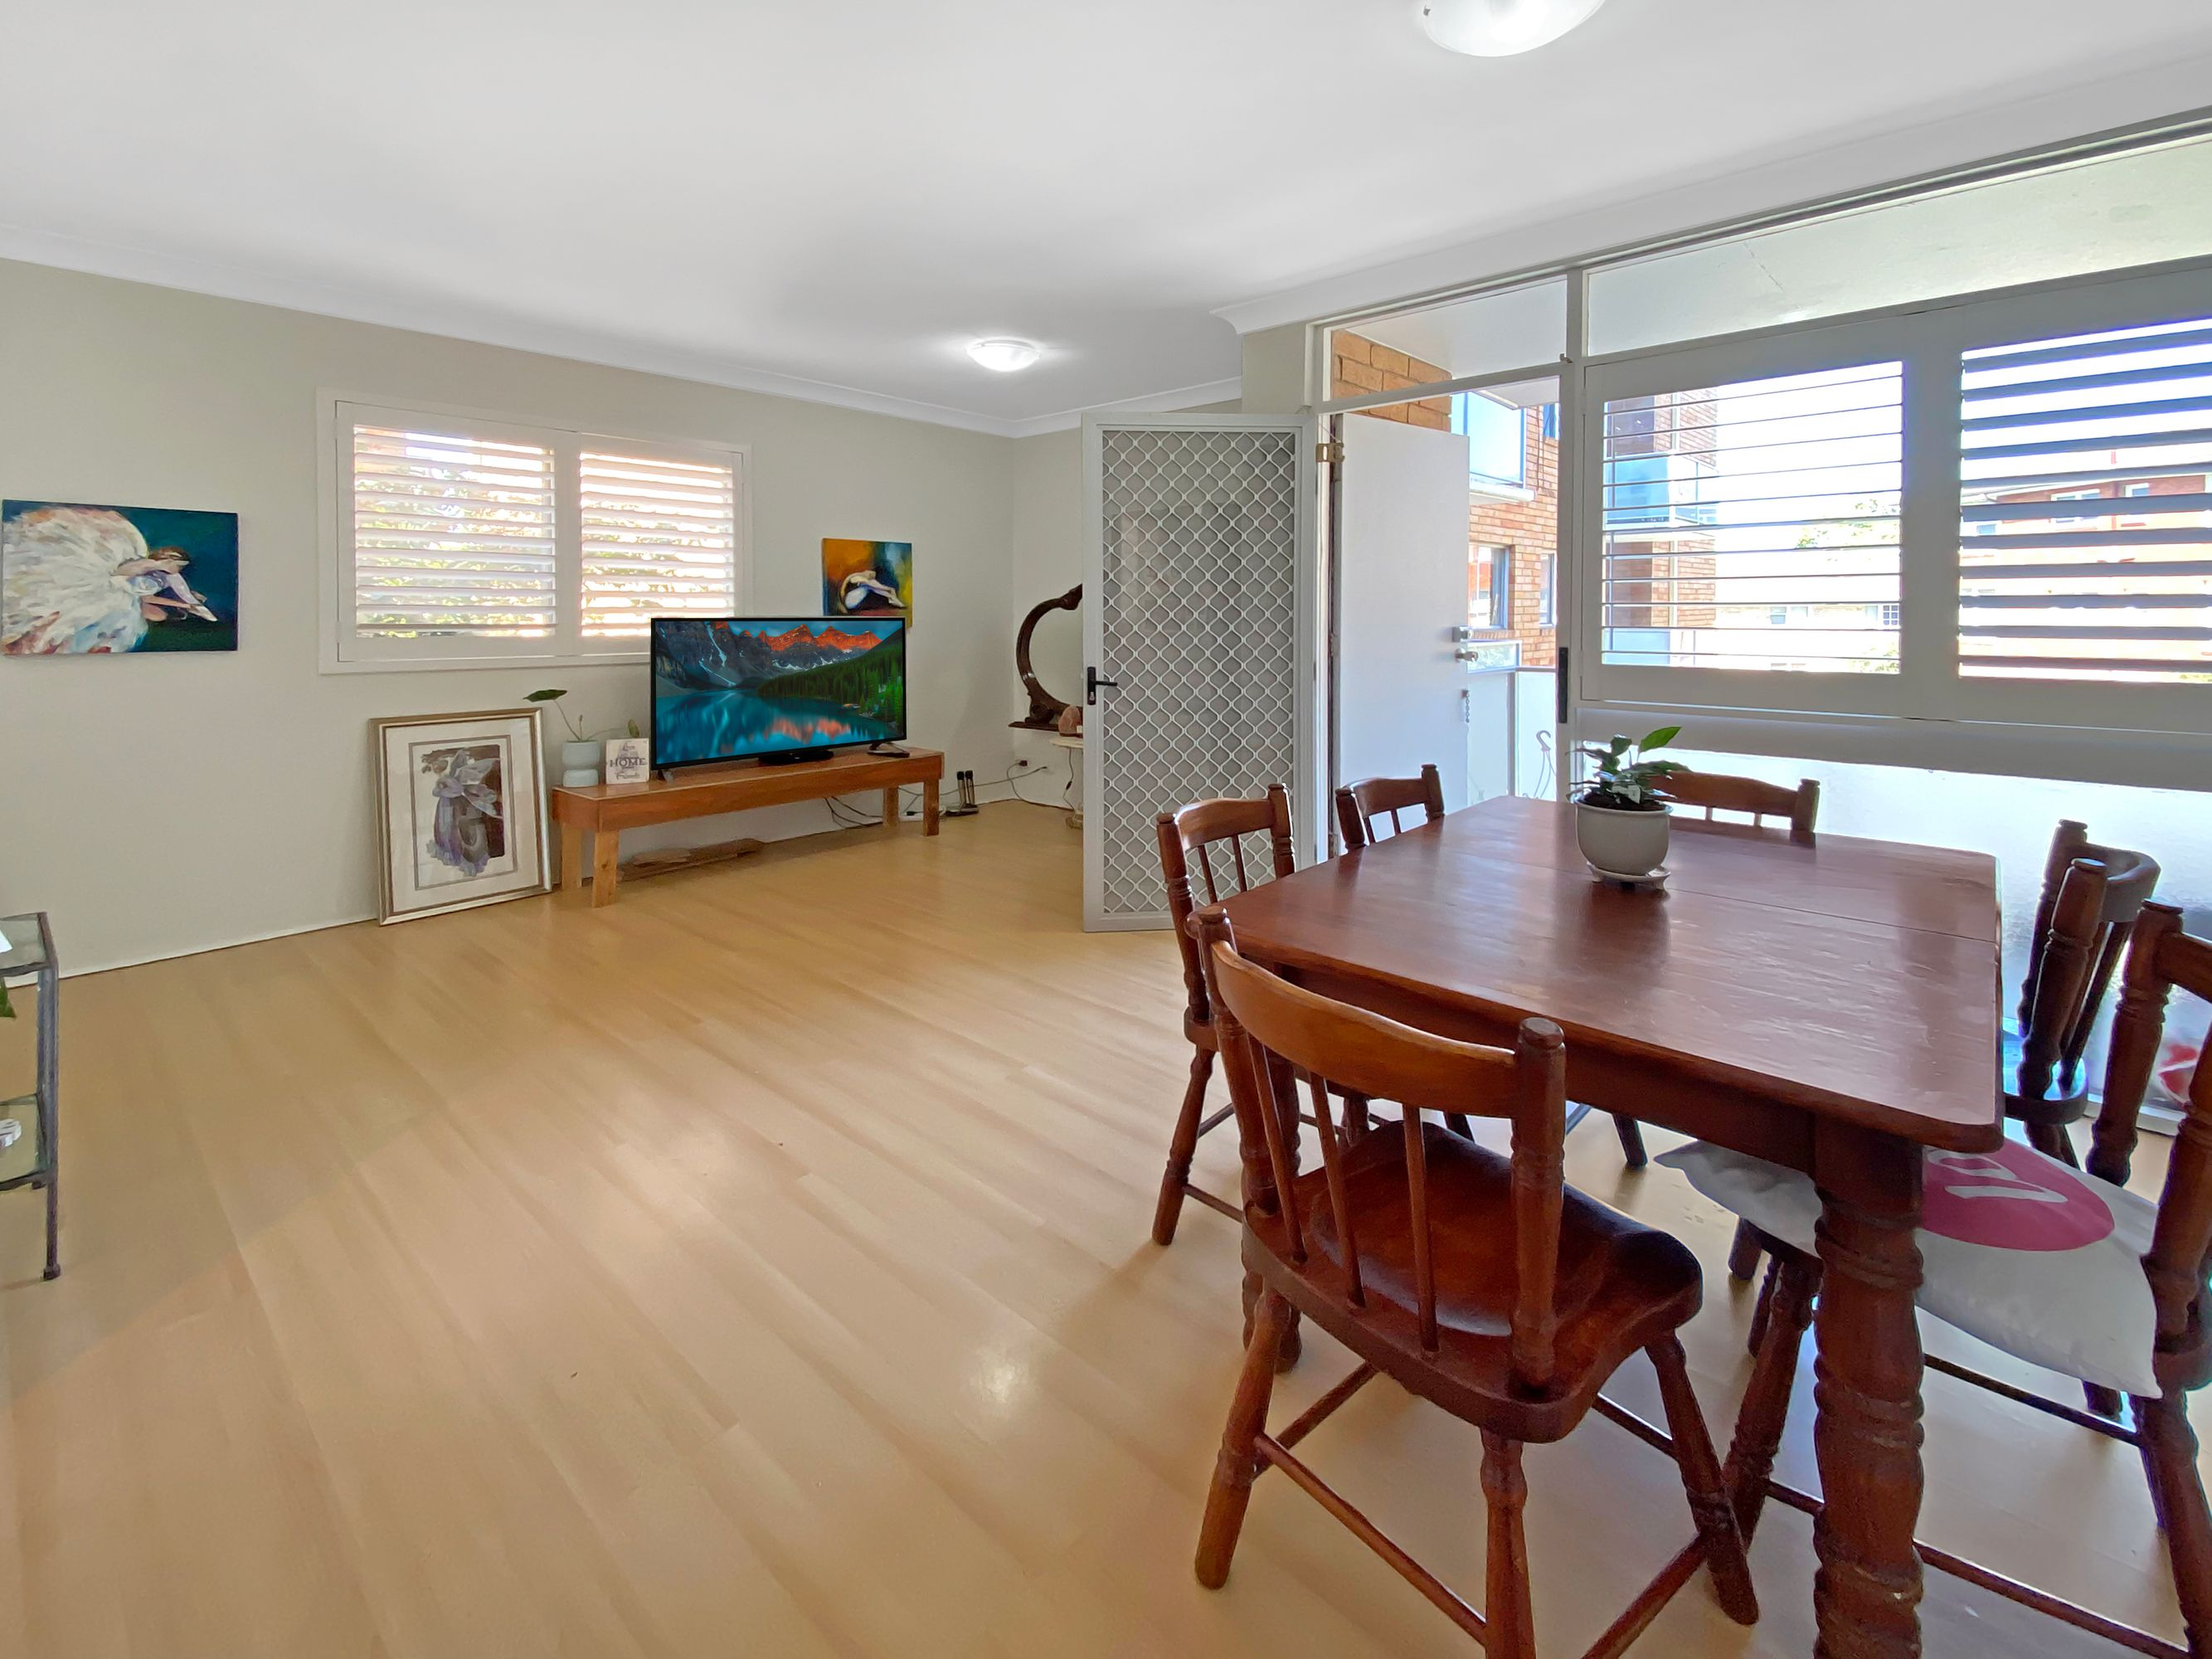 19/5 Stansell Street, Gladesville, NSW 2111